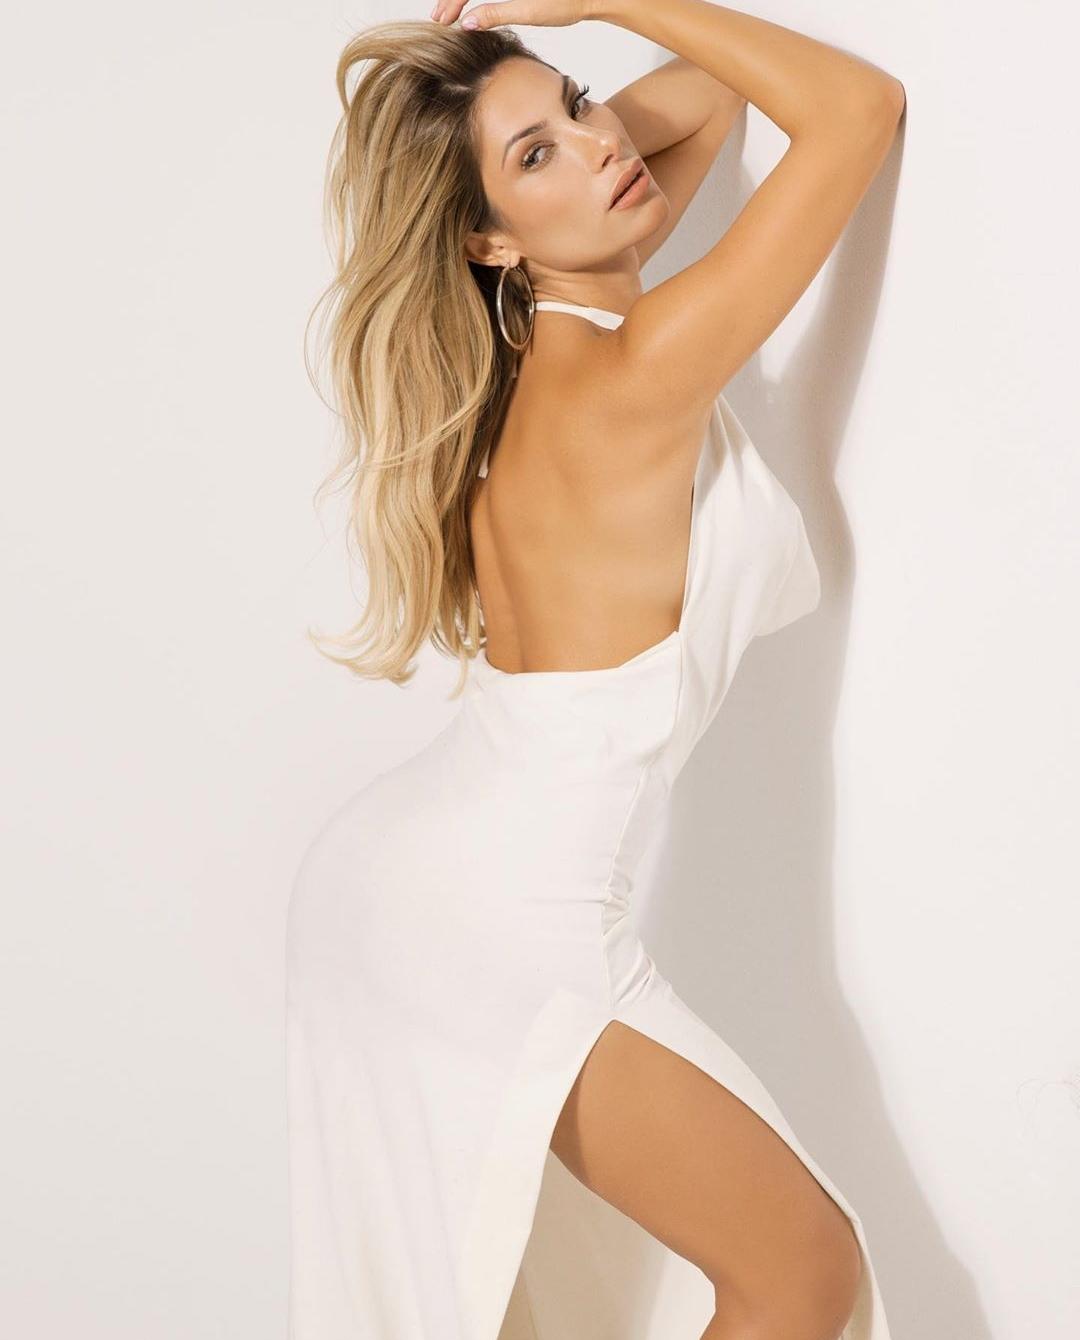 Fernanda Sosa, model, businesswoman and influencer